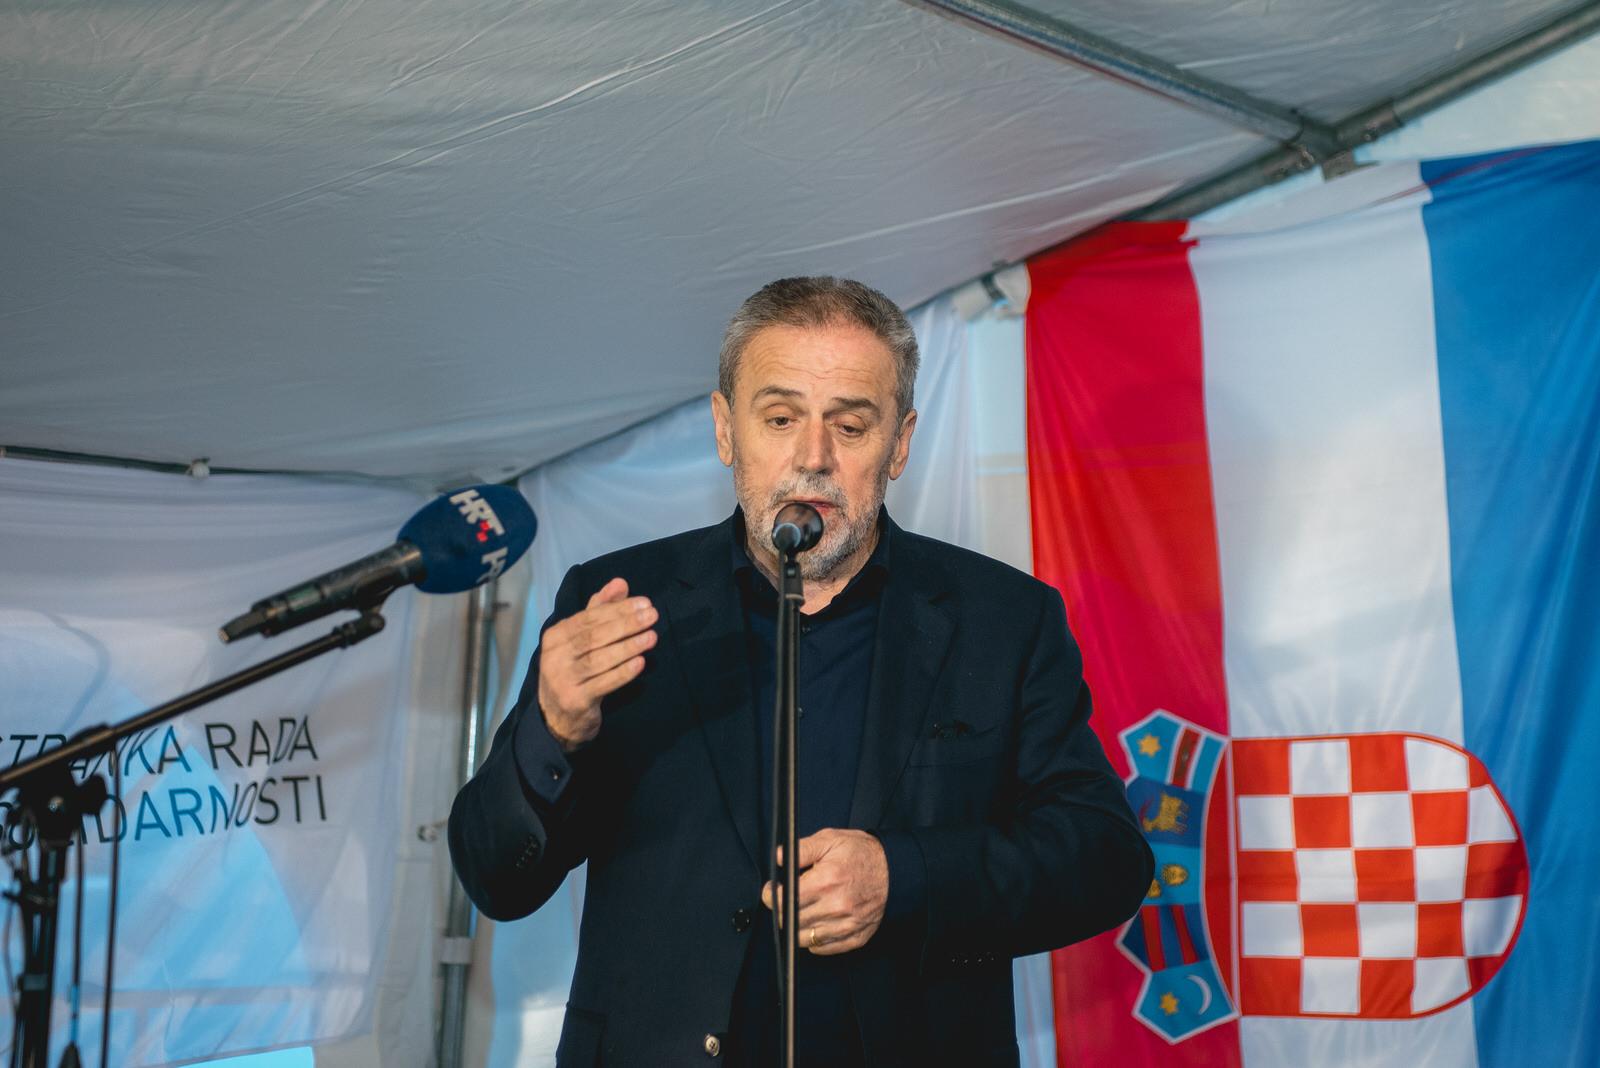 likaclub_milan-bandić-lički-osik_2019-36